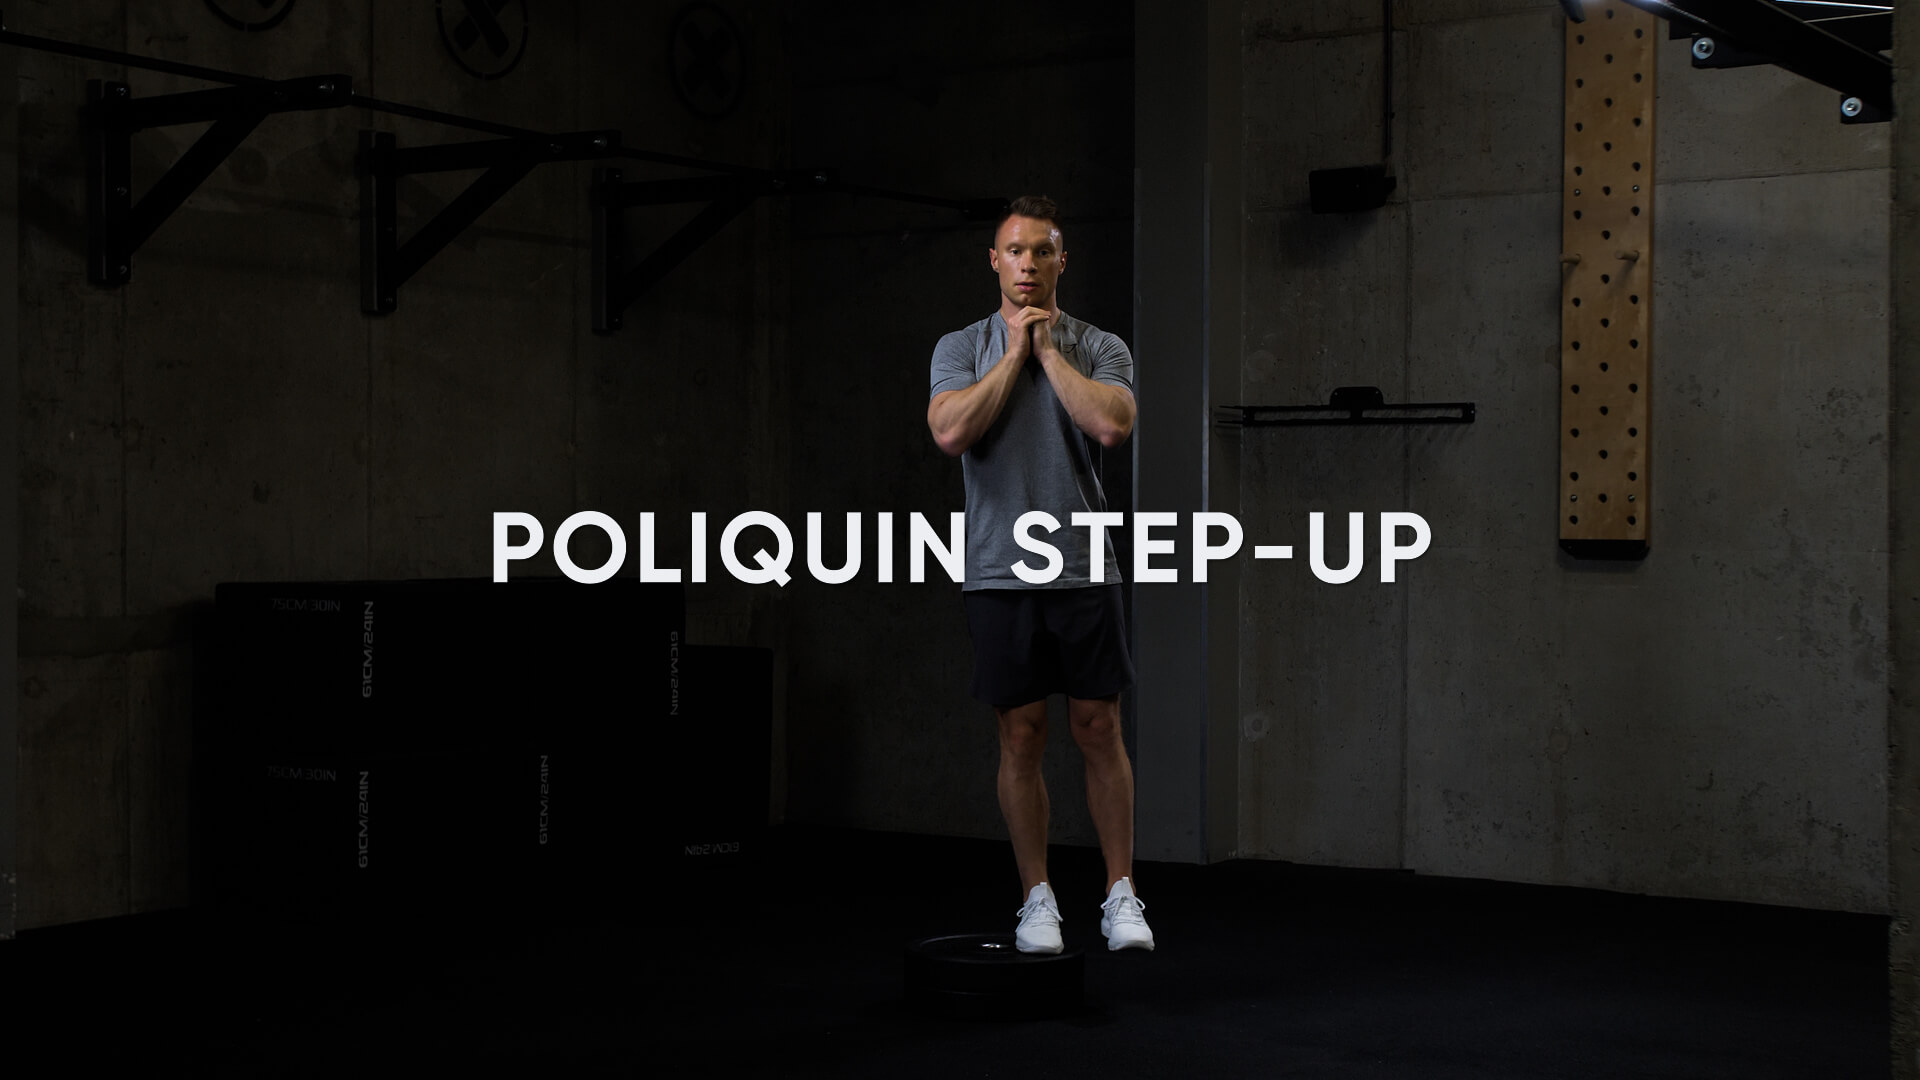 Poliquin Step Up